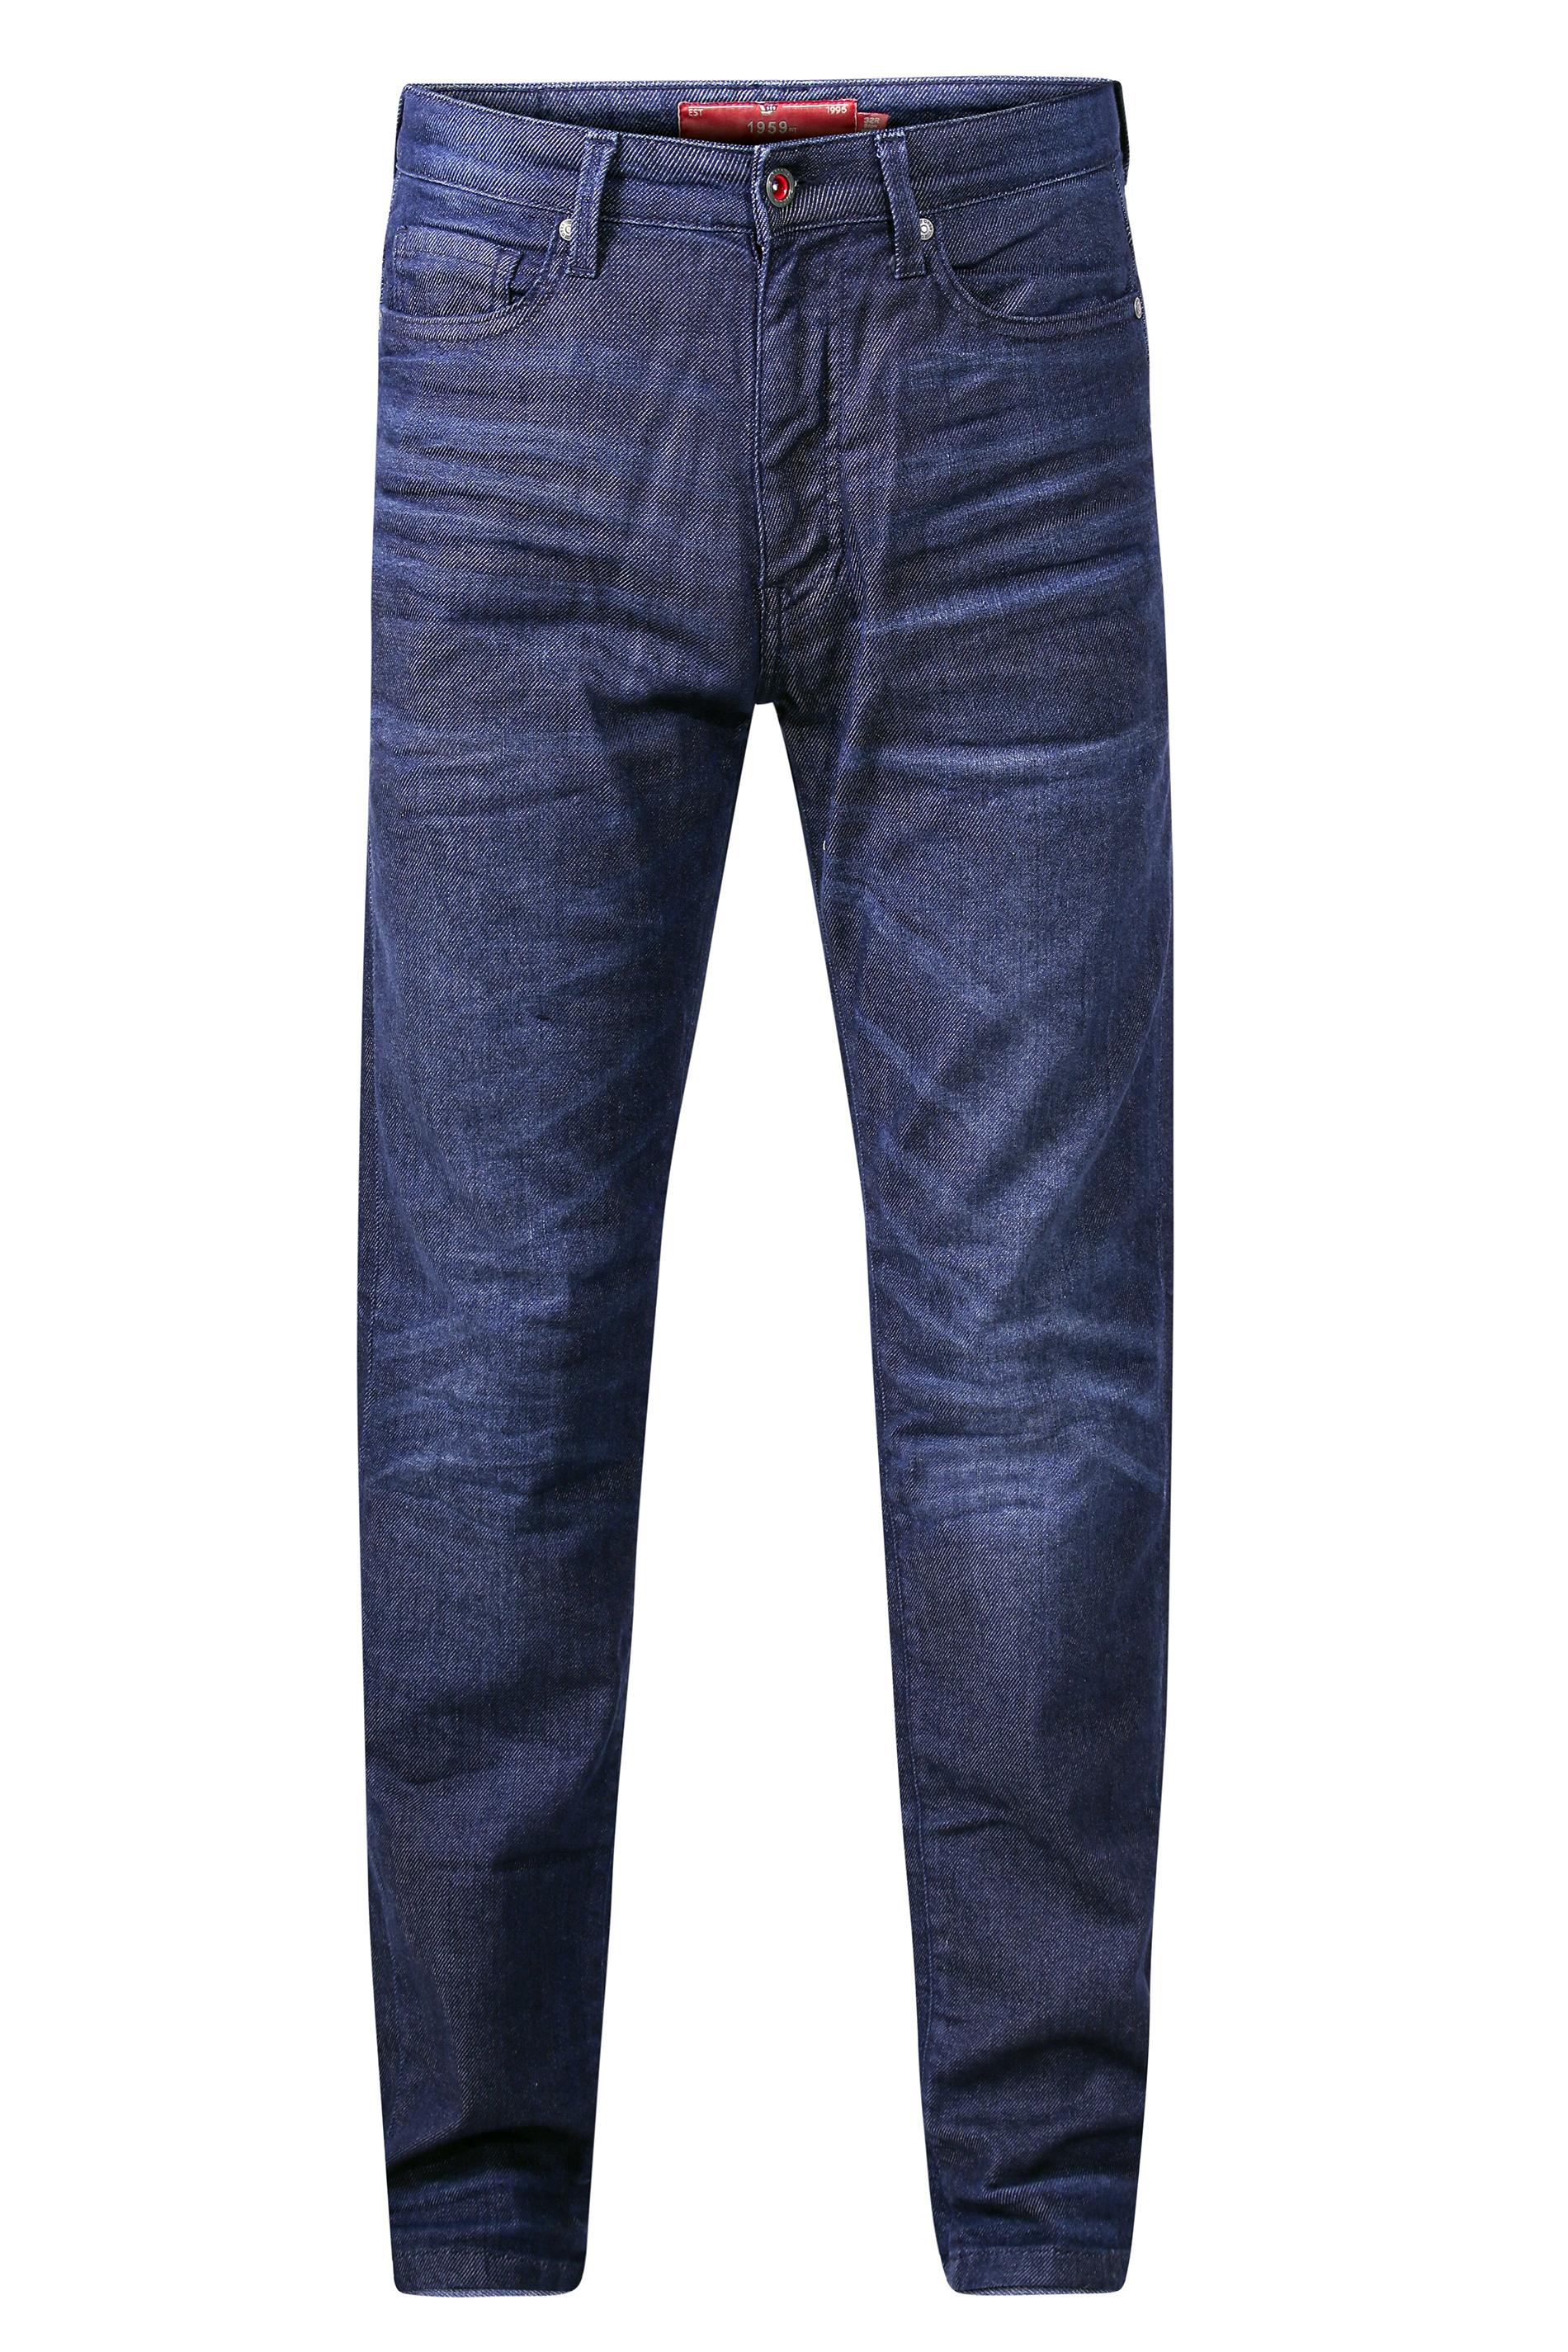 D555 Dark 1959 Straight Leg Stretch Jeans